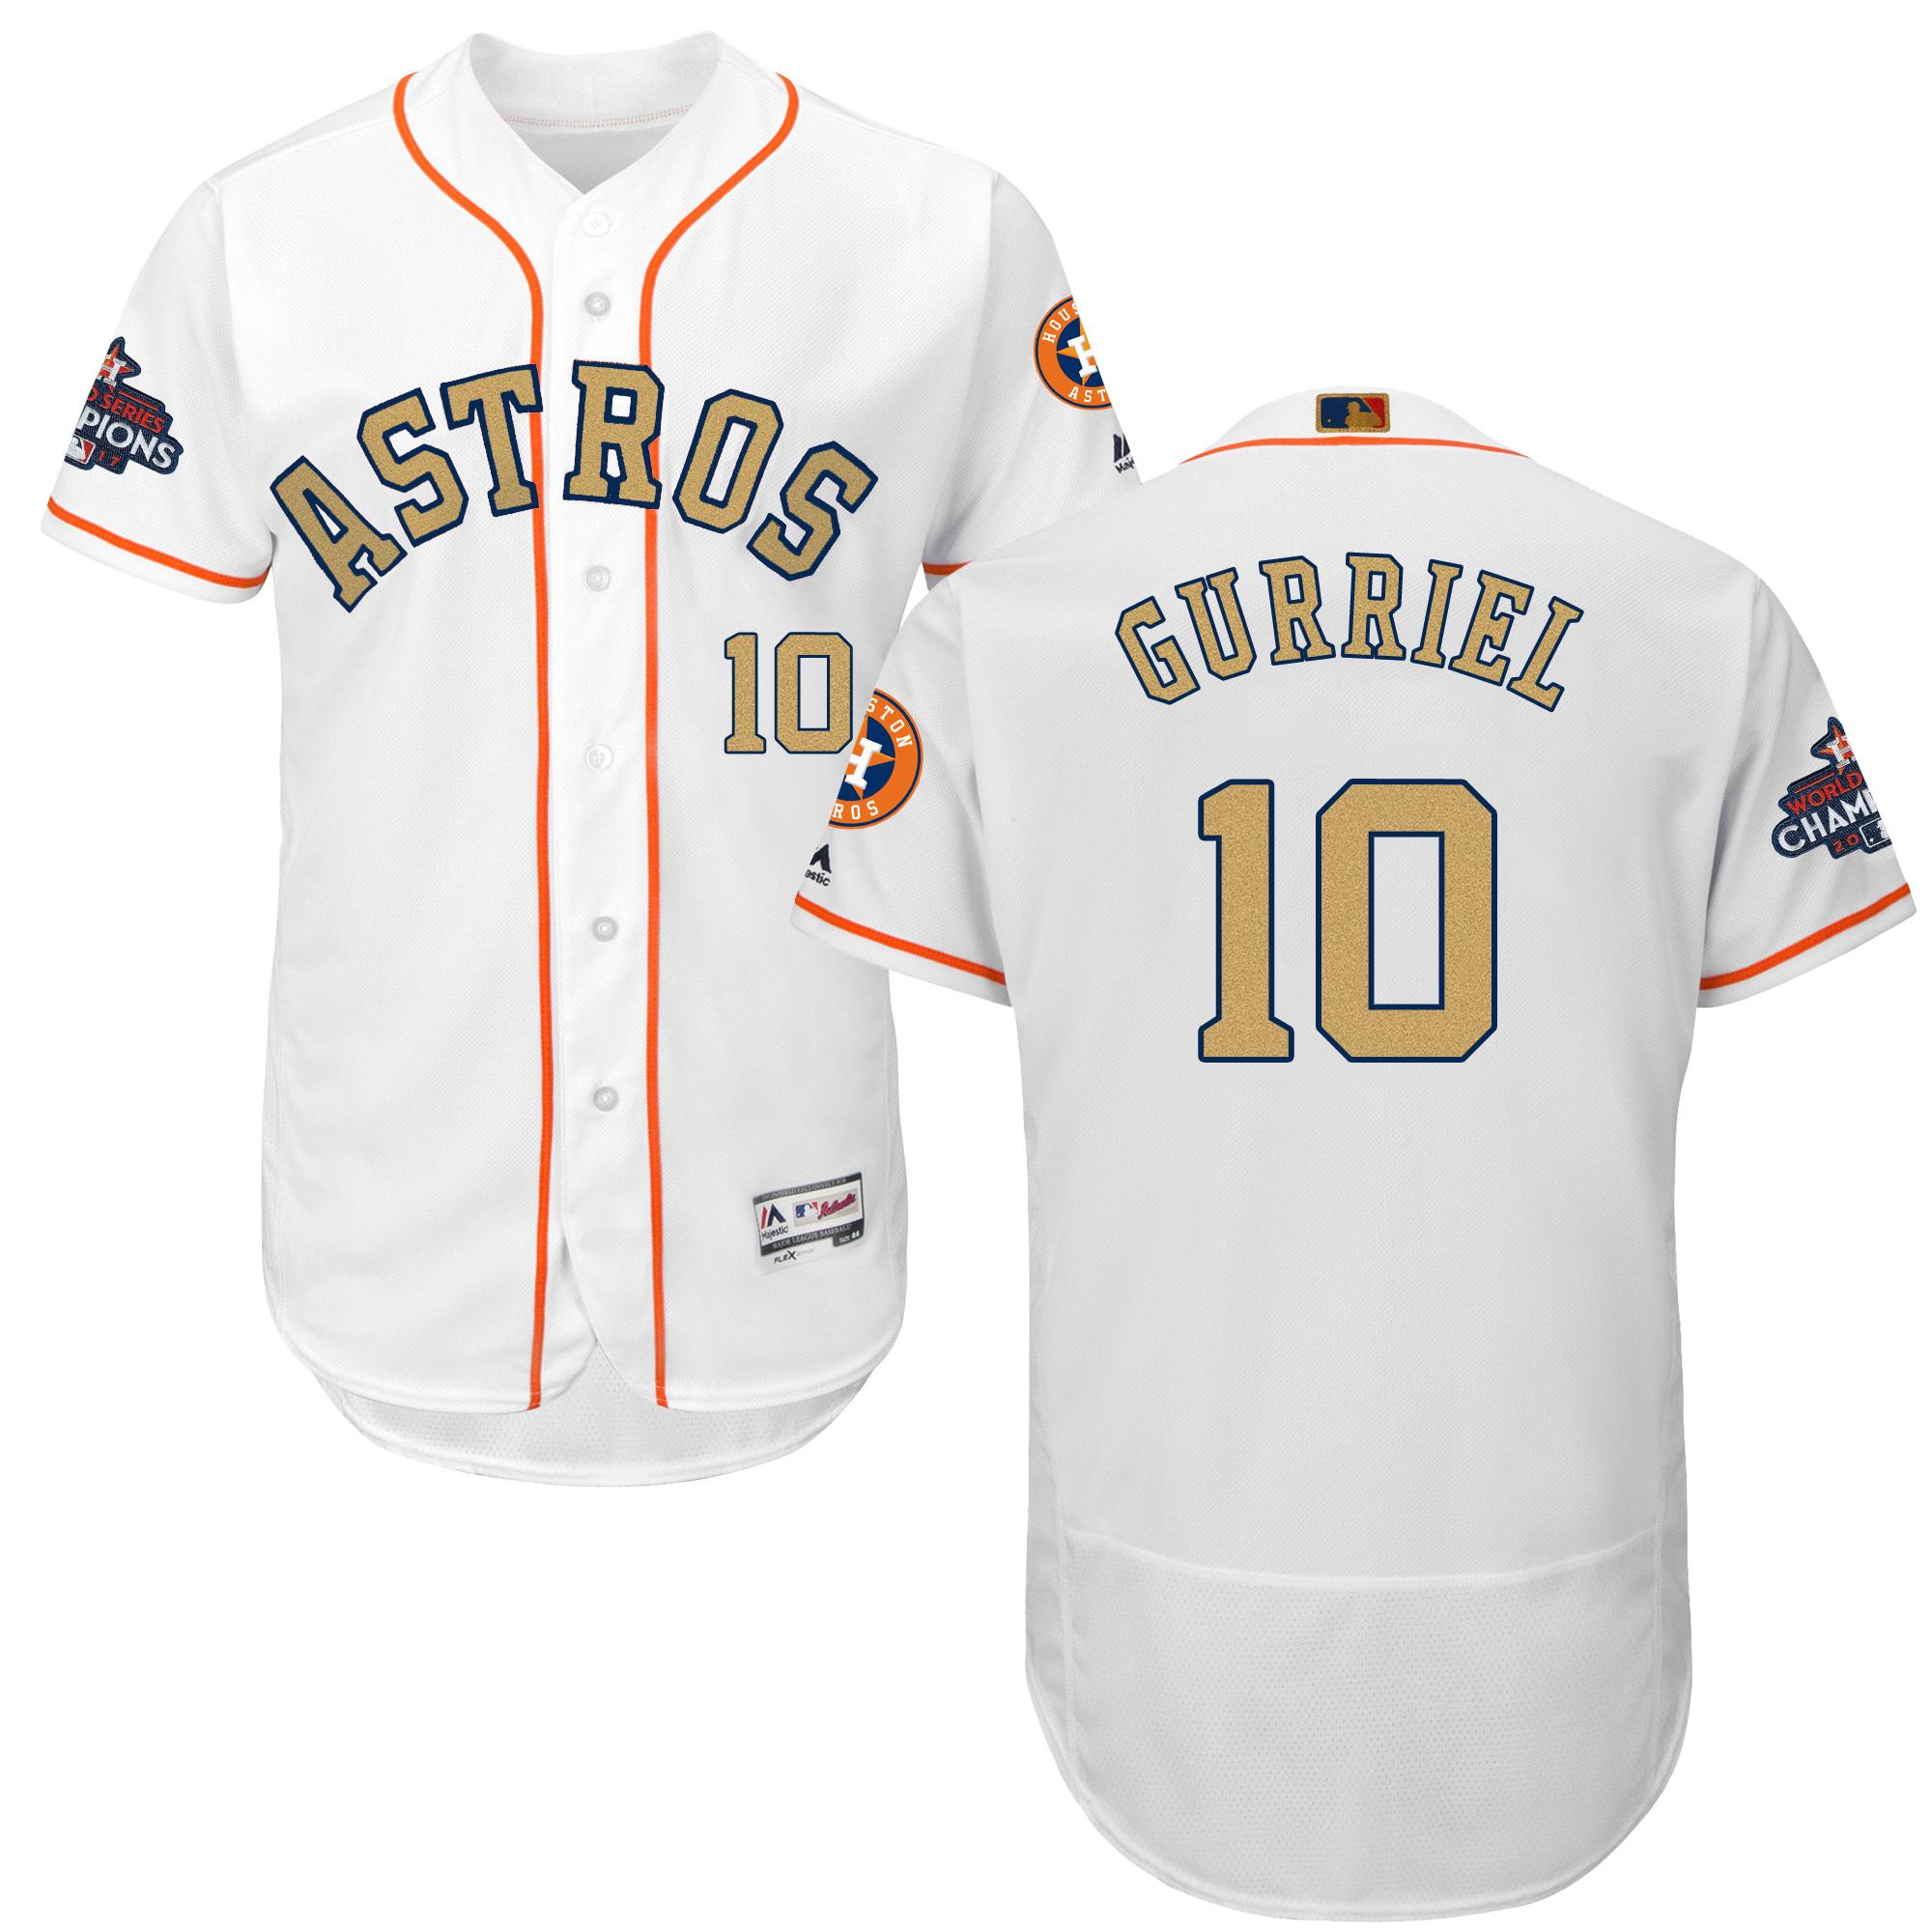 Astros 10 Yuli Gurriel White 2018 Gold Program Flexbase Jersey